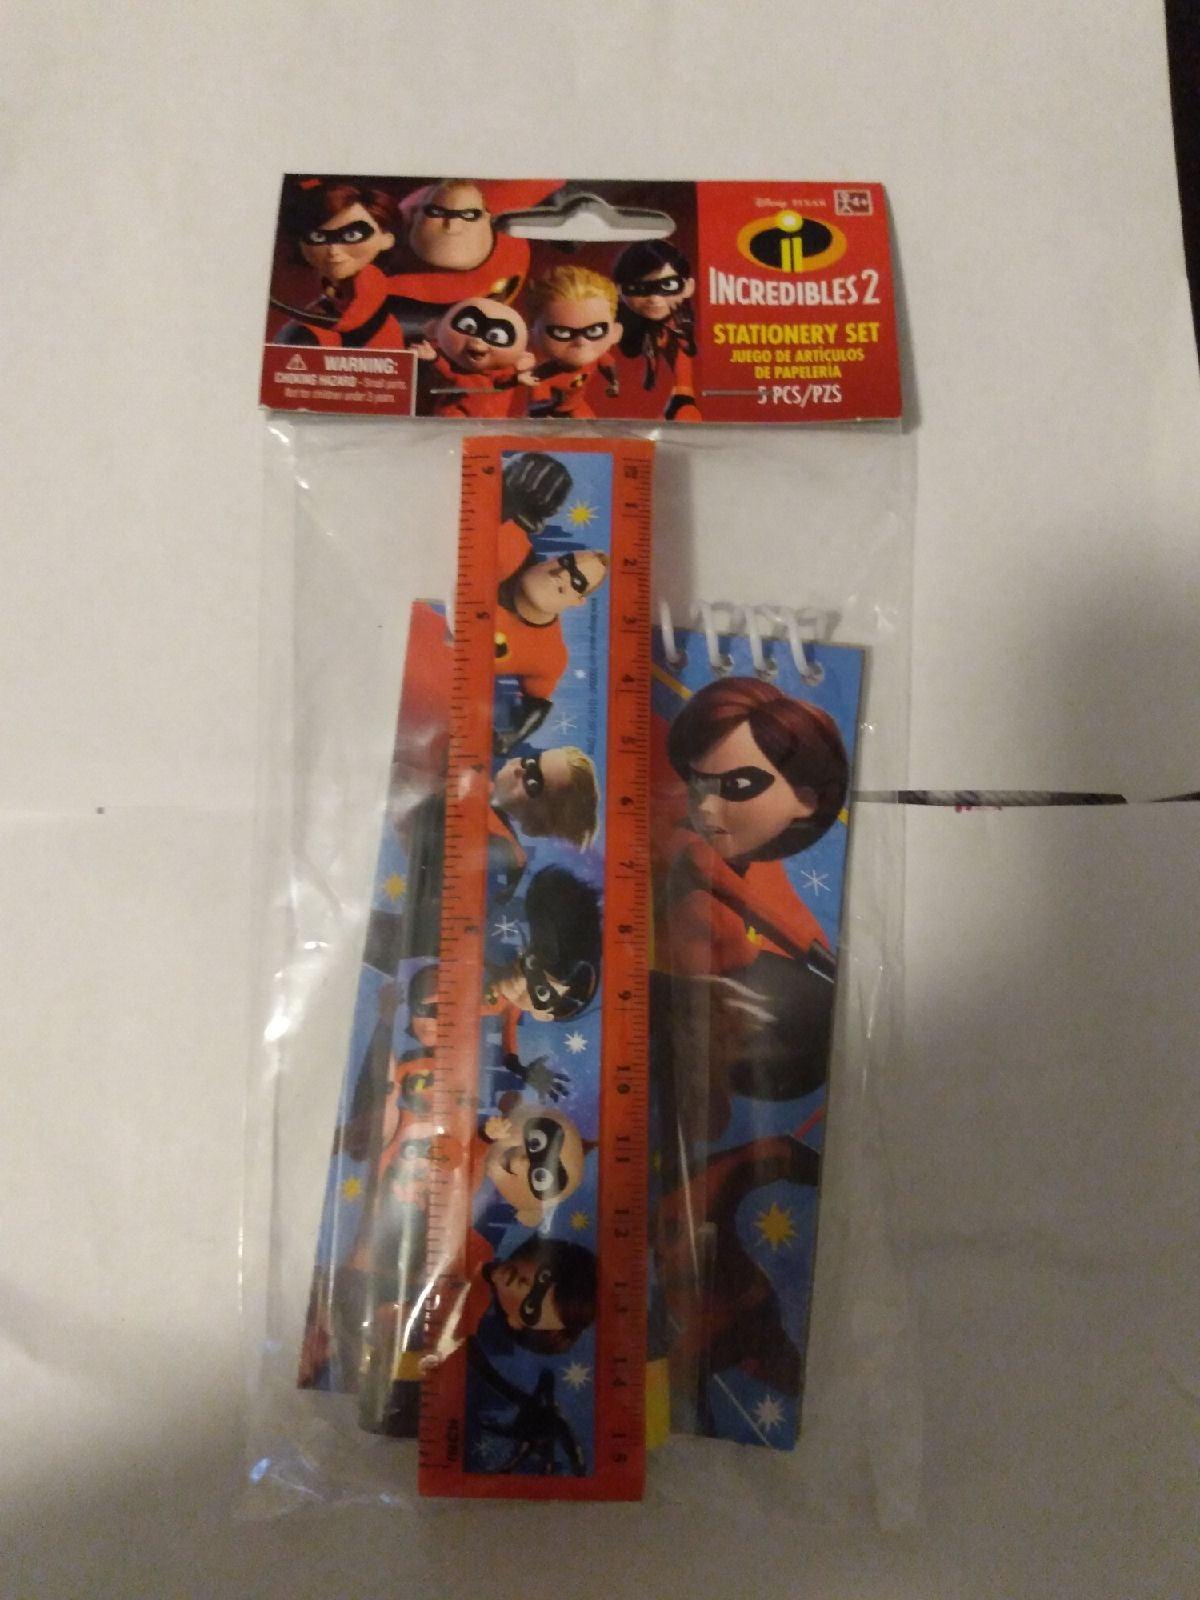 NIP Incredibles 2 Stationery Set